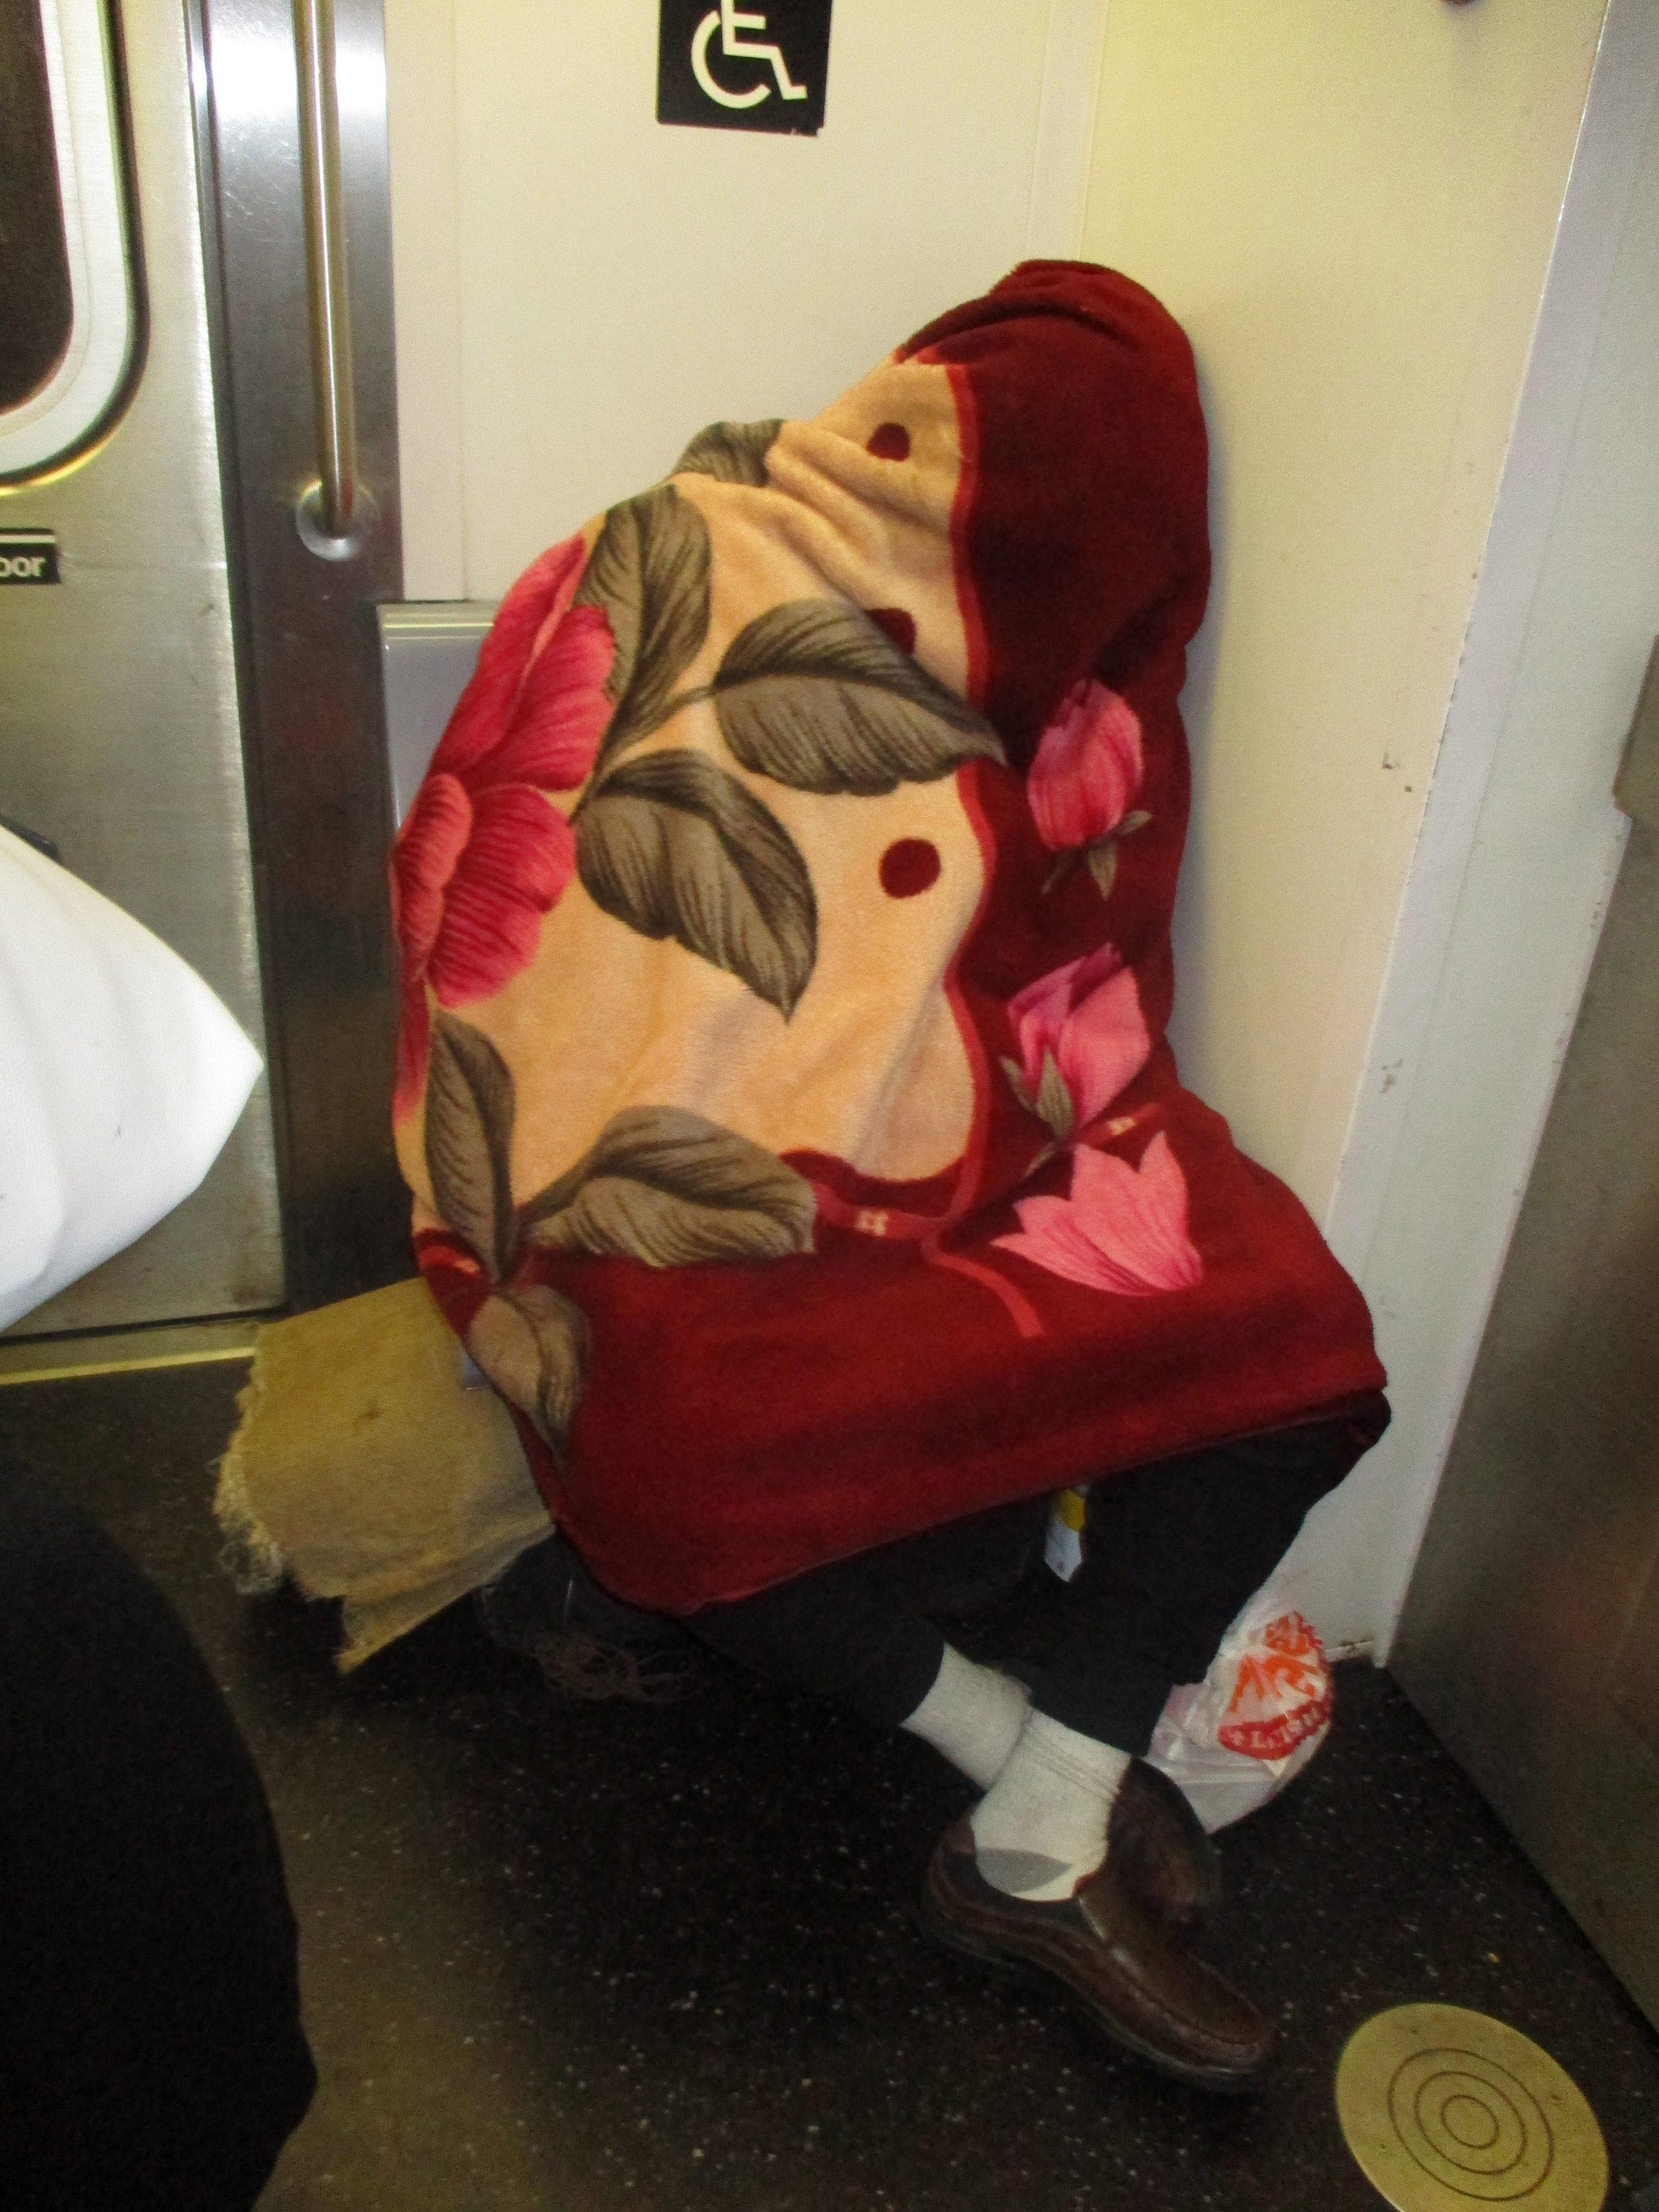 Man on the train trying to sleep.